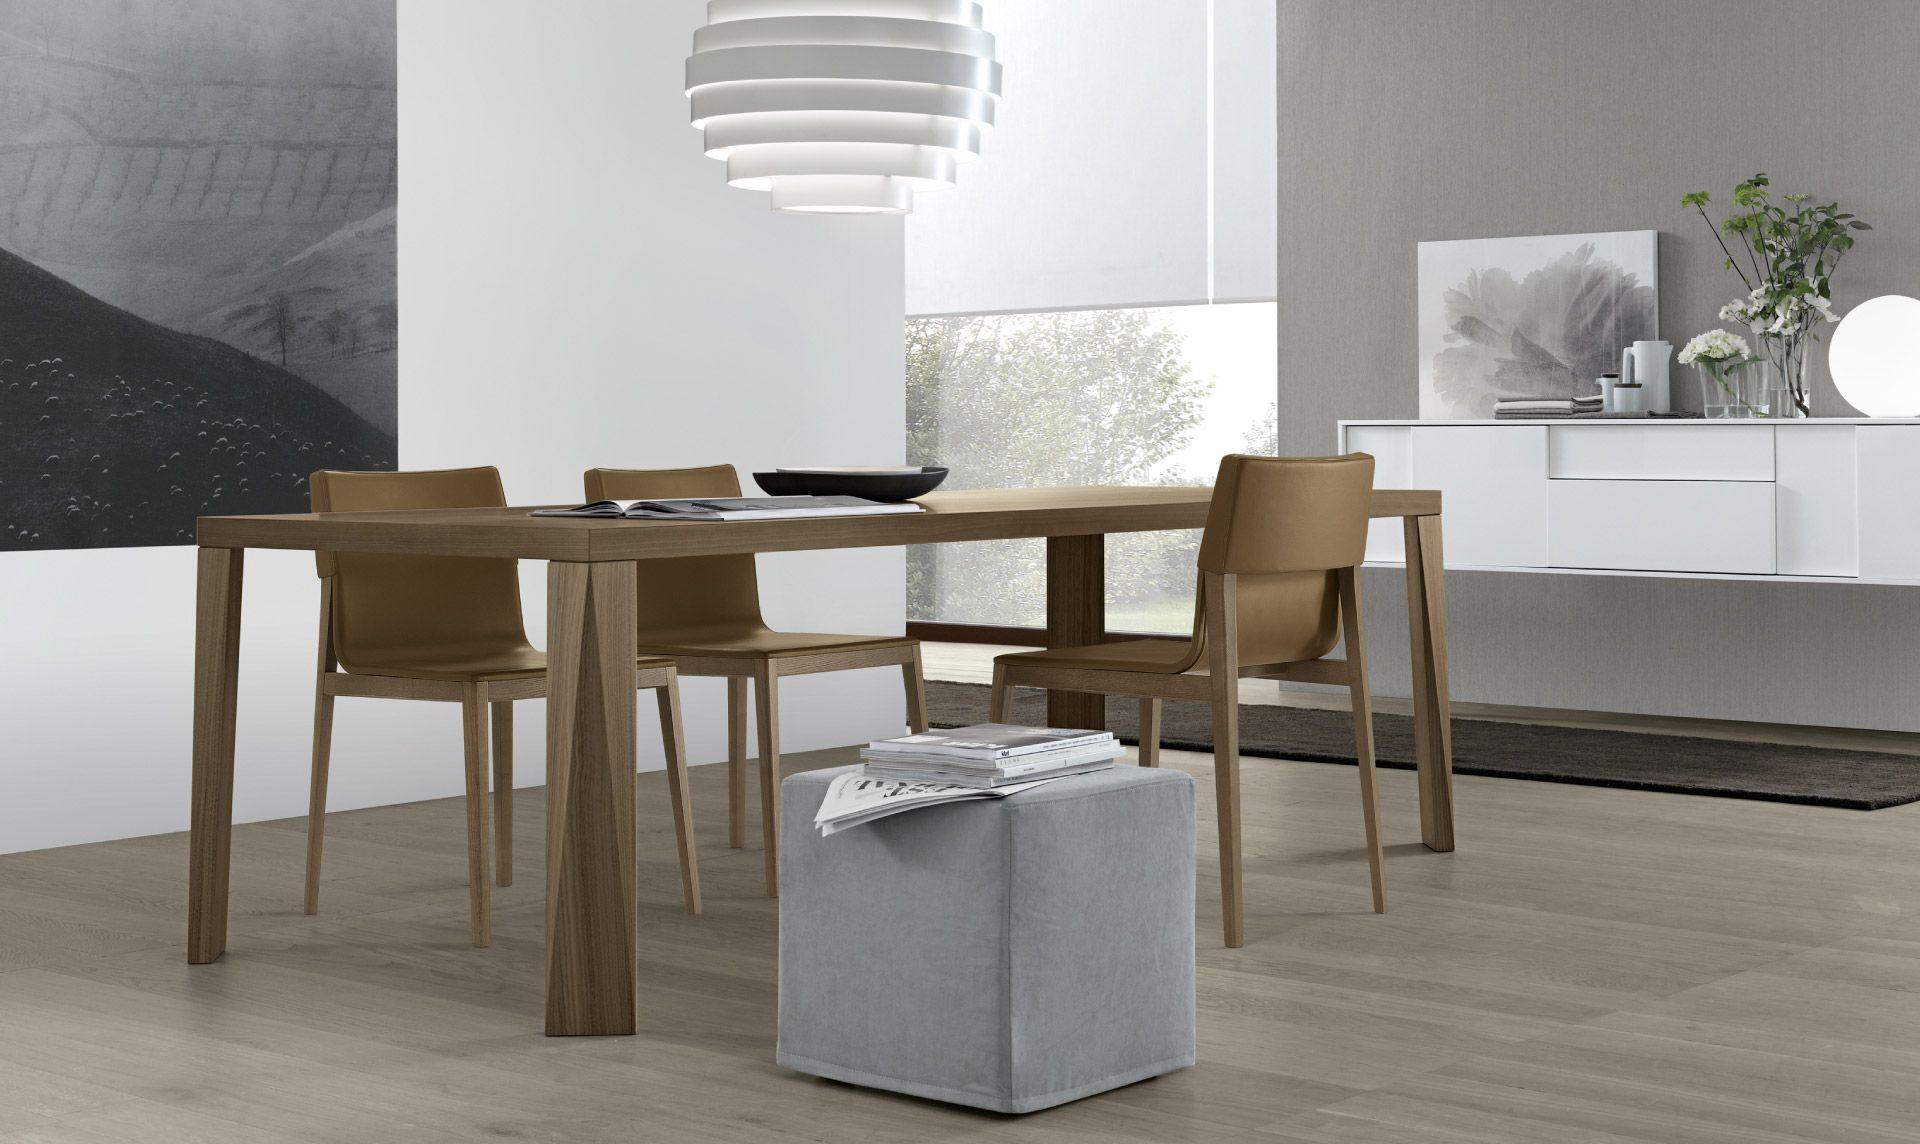 Jesse mobili arredamento design tavoli suomi for Mobili contemporanei moderni